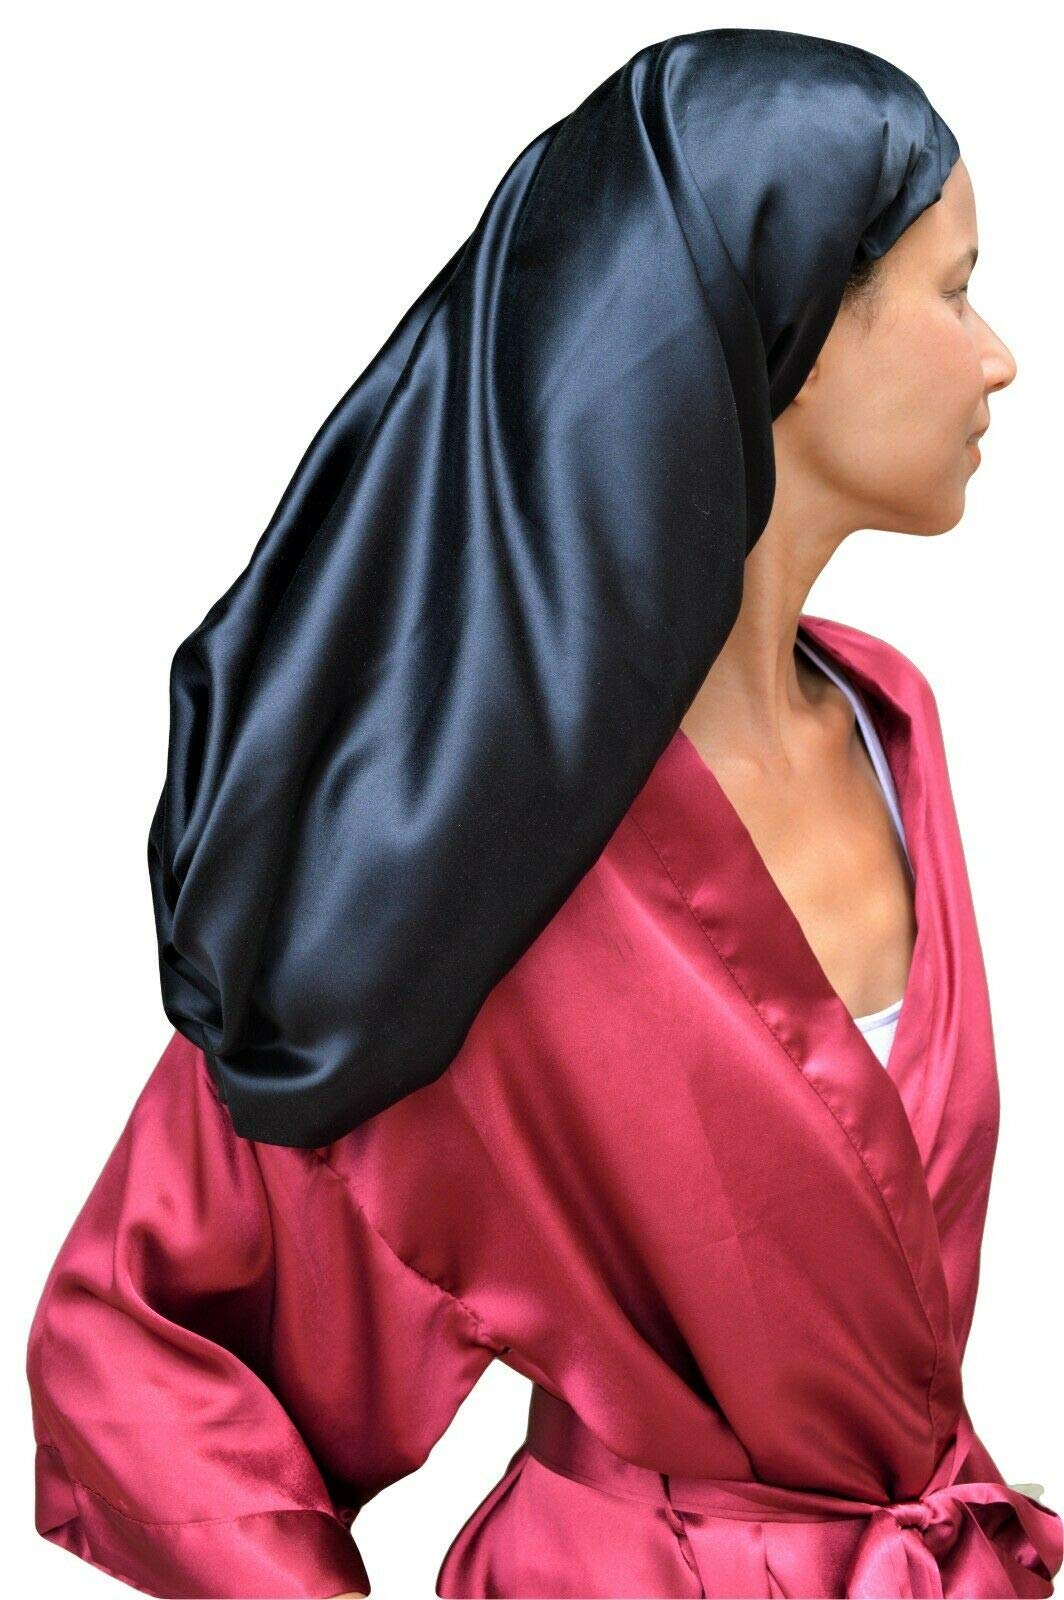 Sleep Tight Hair Wrap 100% Mulberry Silk Satin 40 momme 25'' XLong Luxury Sleep Cap for Natural Hair (XLong) (XLong) by Sleep Tight Wrap